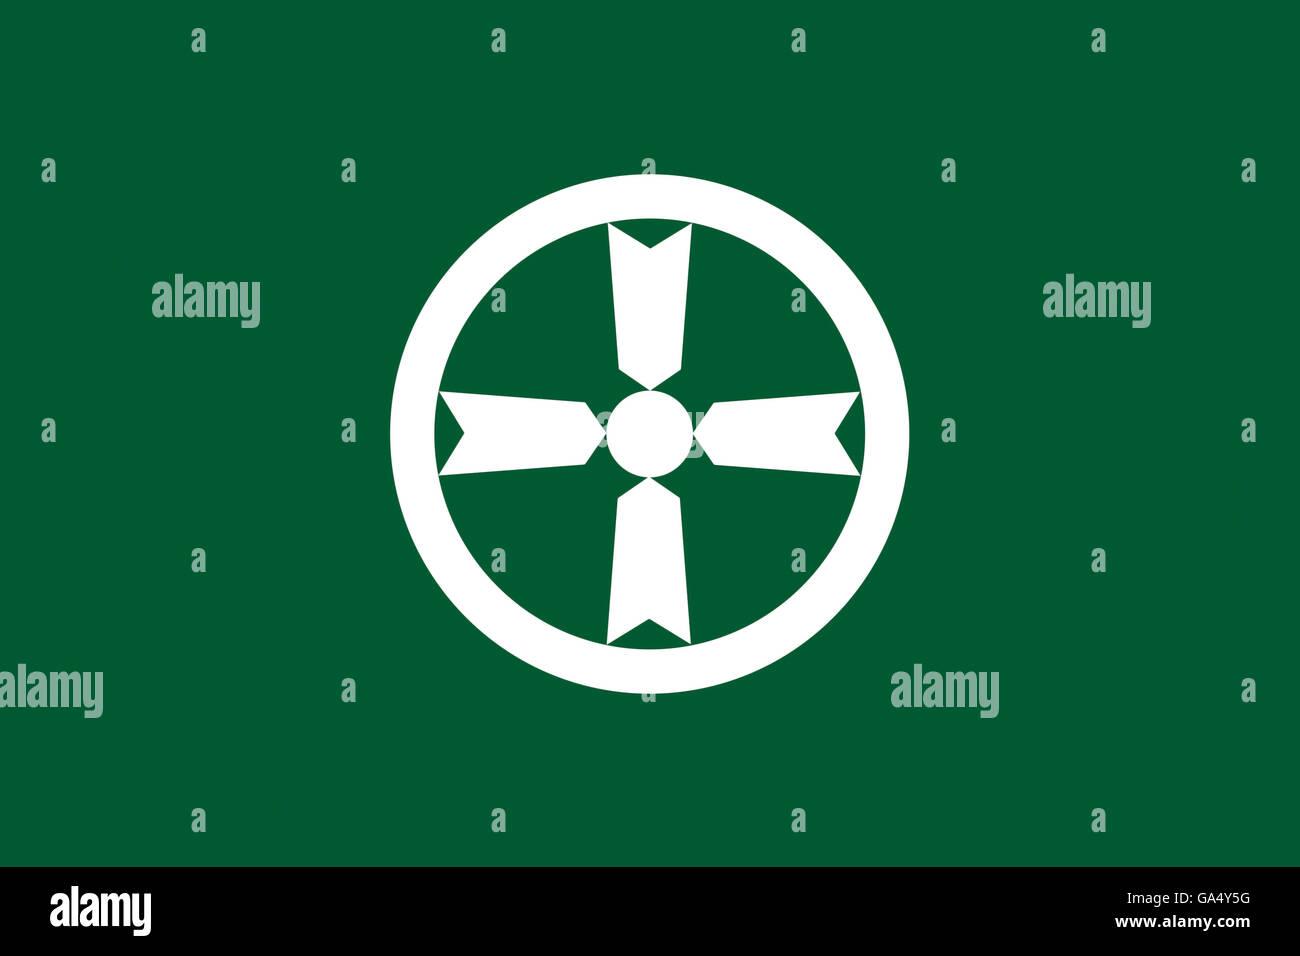 Japan Akita prefecture Akita city flag illustration - Stock Image